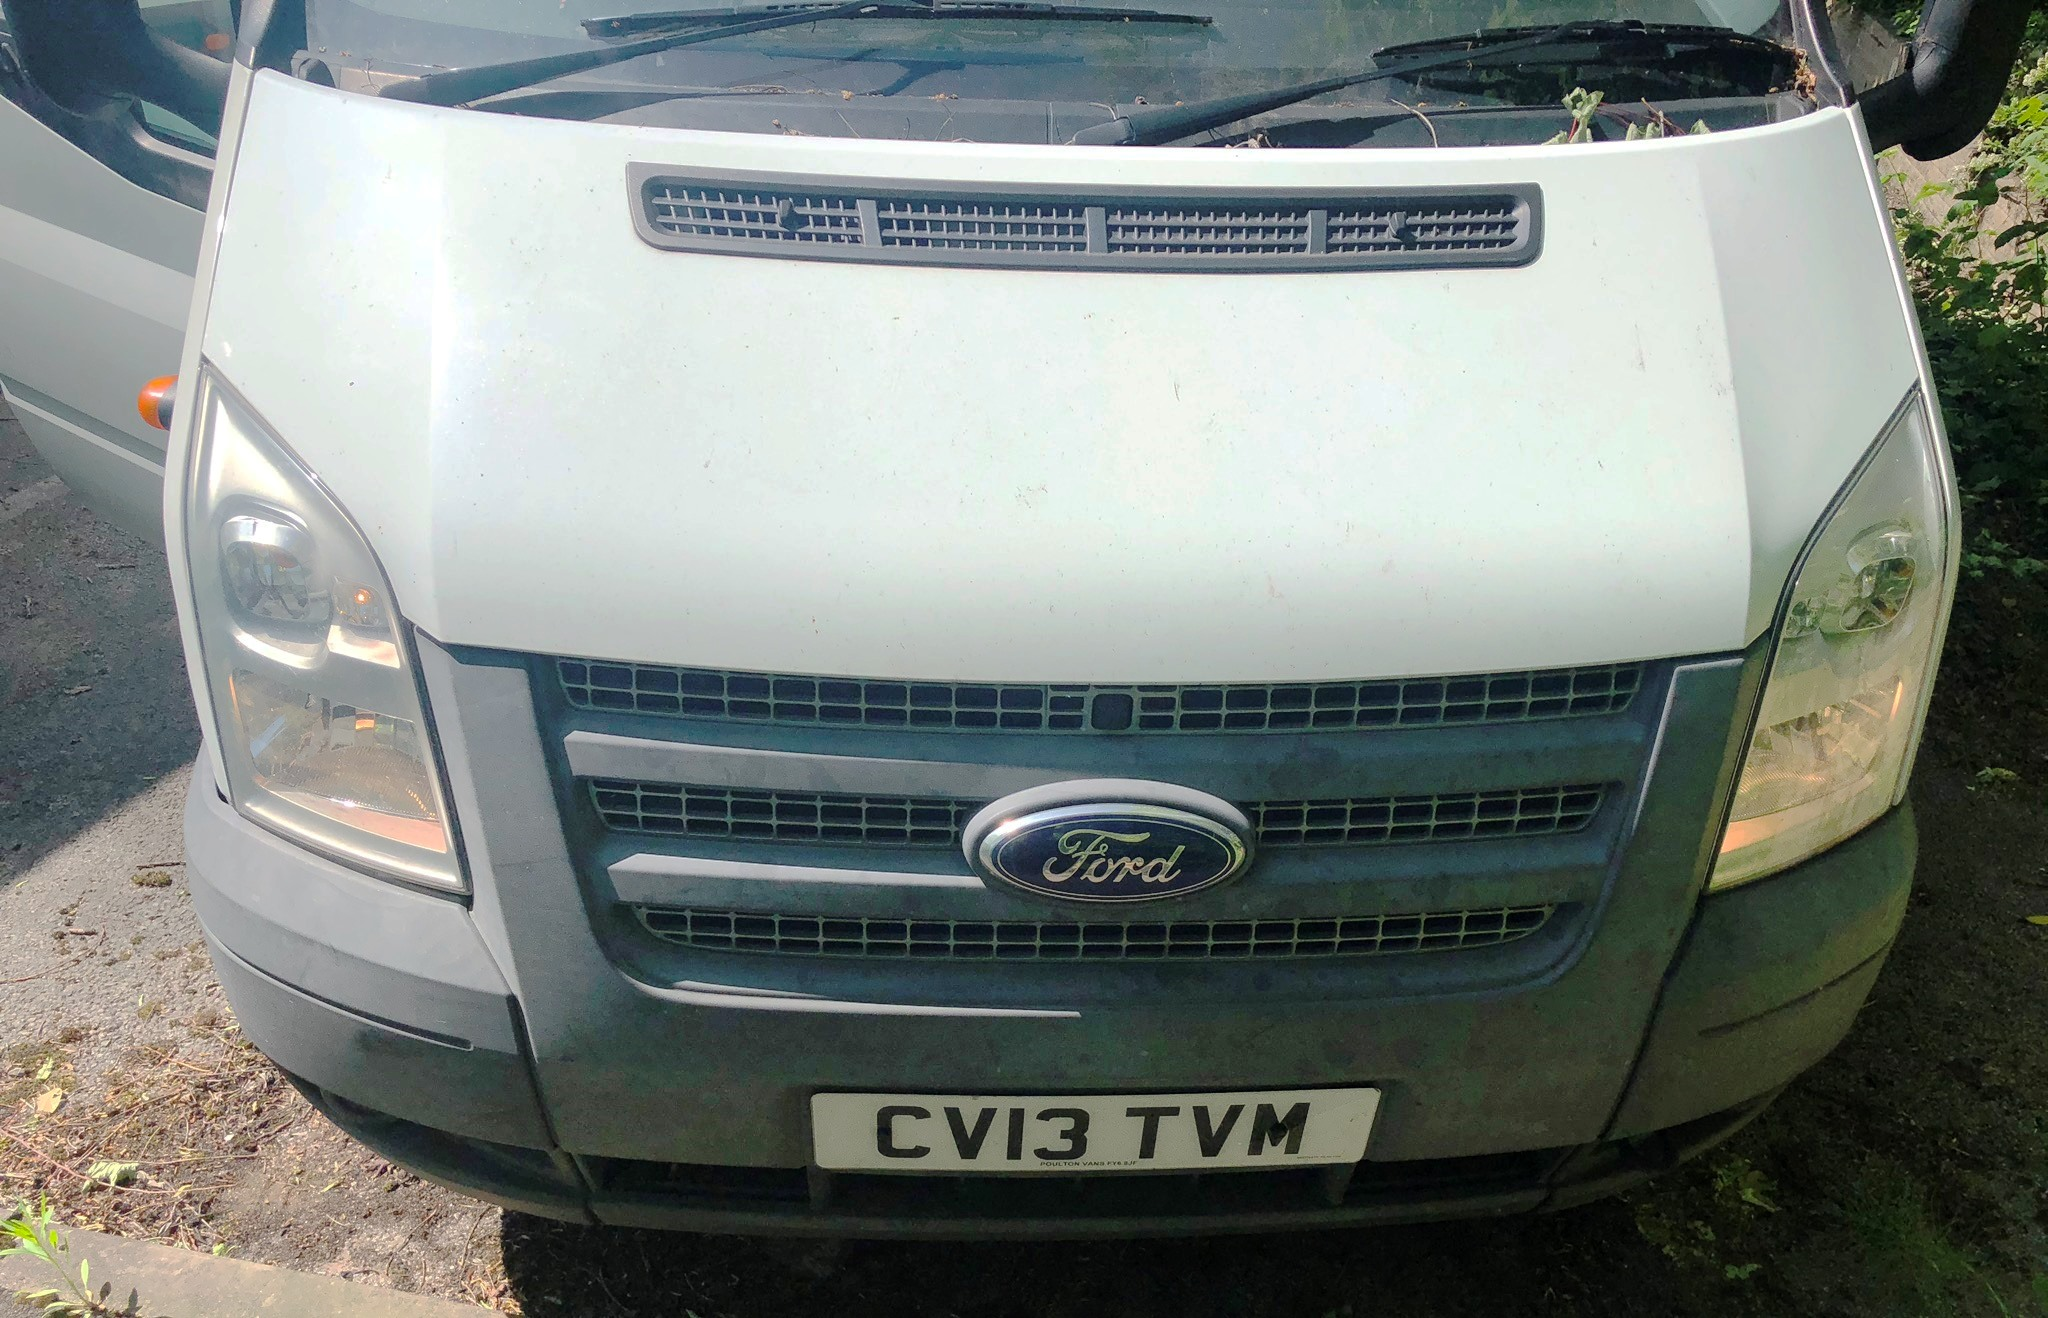 White Ford Transit 155 T350 RWD 3.5T w/ Tail Lift | Reg: CV13 TVM | Mileage: 91,513 - Image 3 of 8